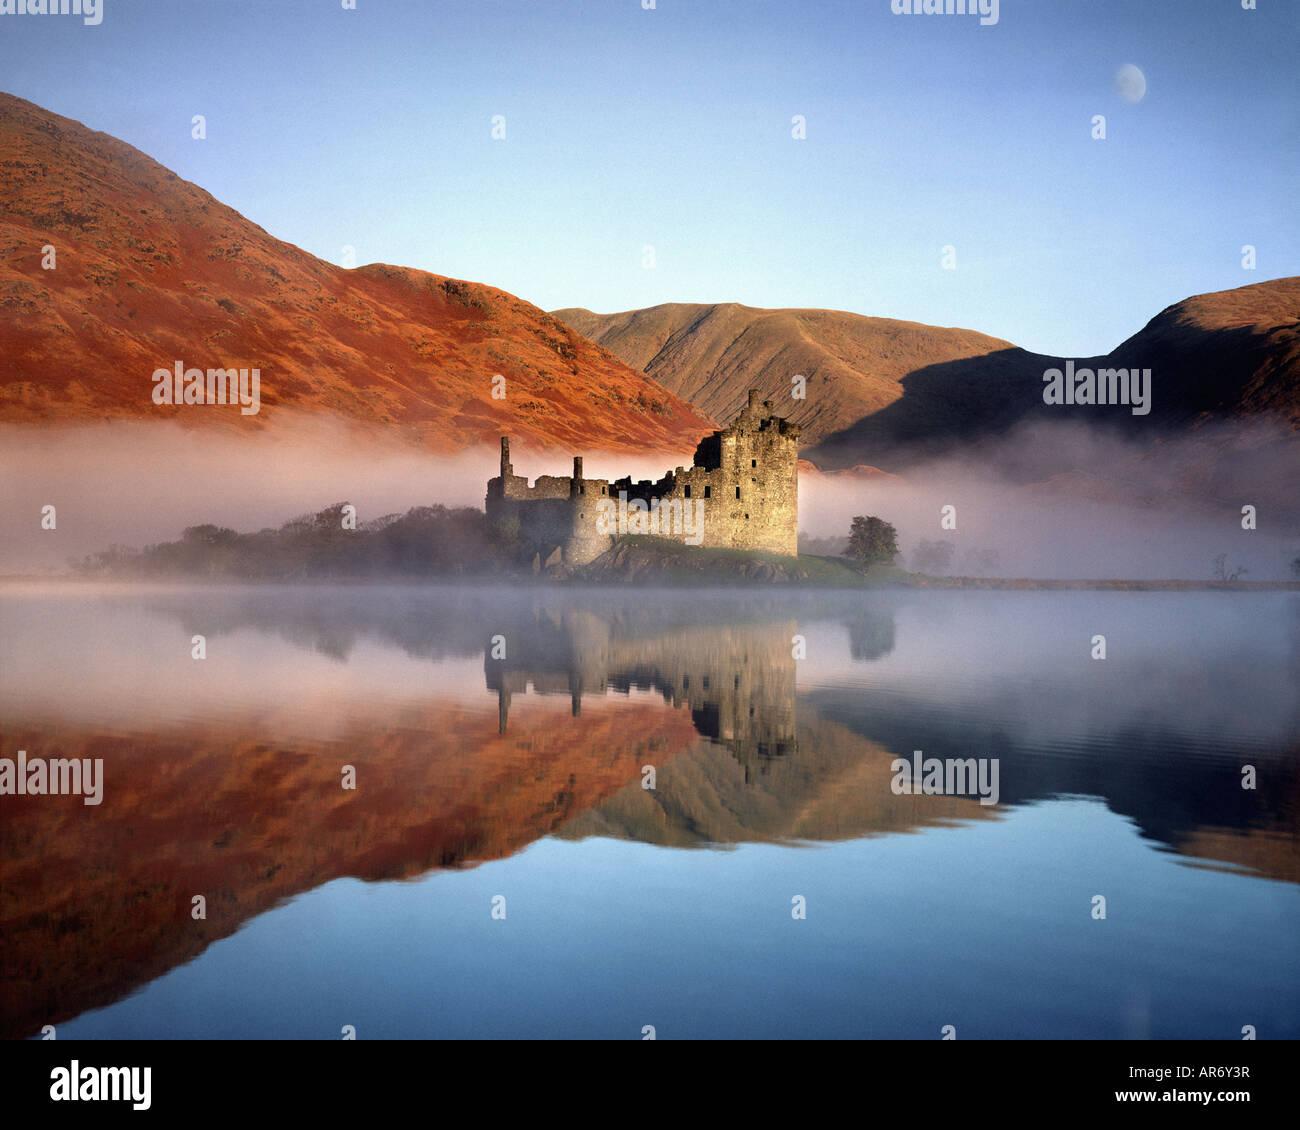 GB - SCOTLAND:  Kilchurn Castle on Loch Awe - Stock Image